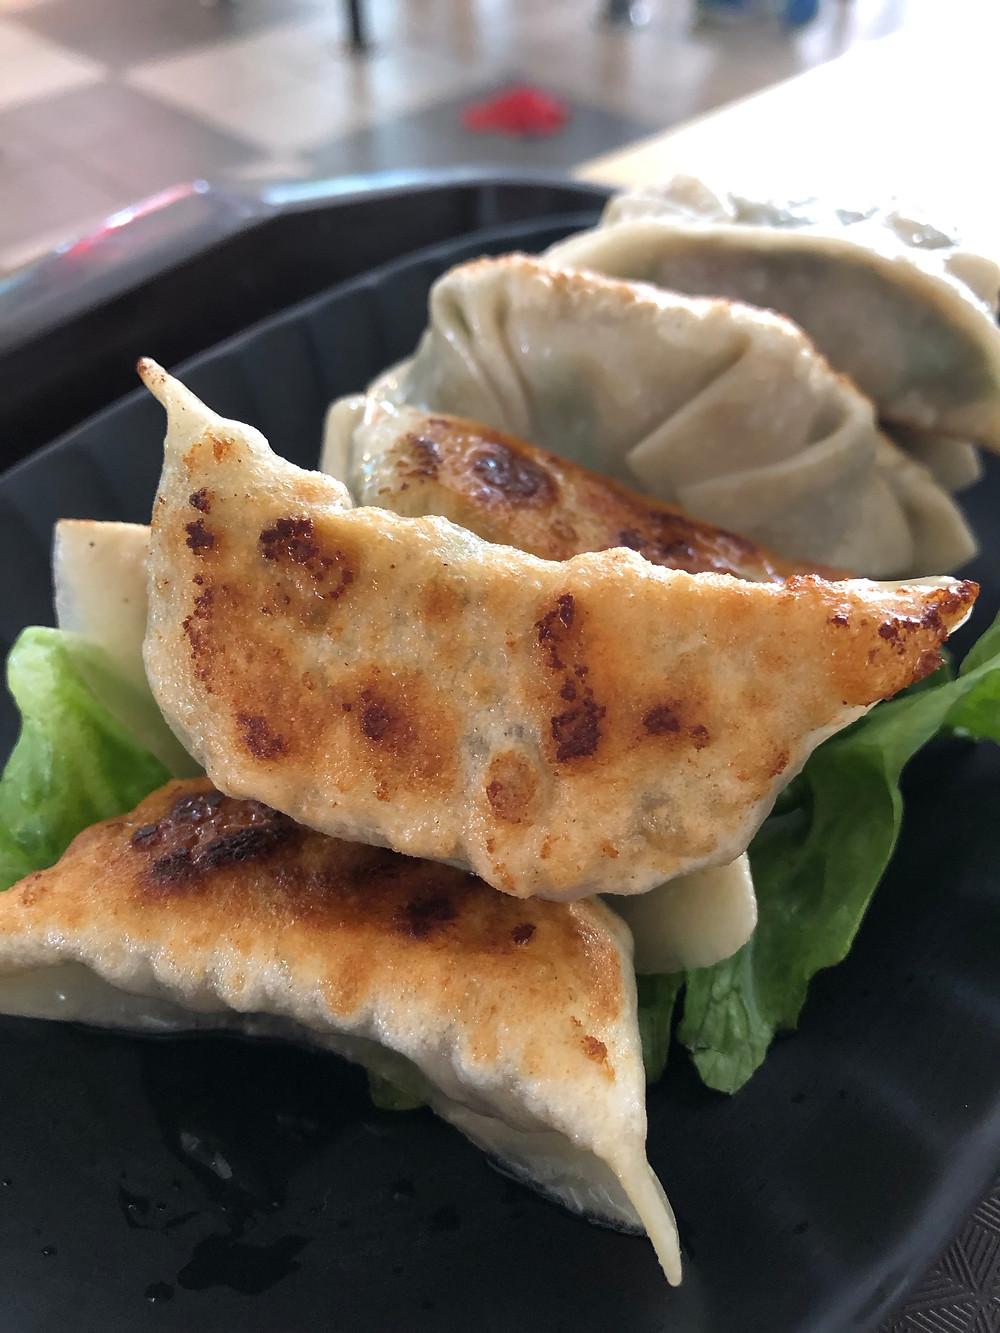 pan fried dumplings from the hawker center // sunnyinjune.com